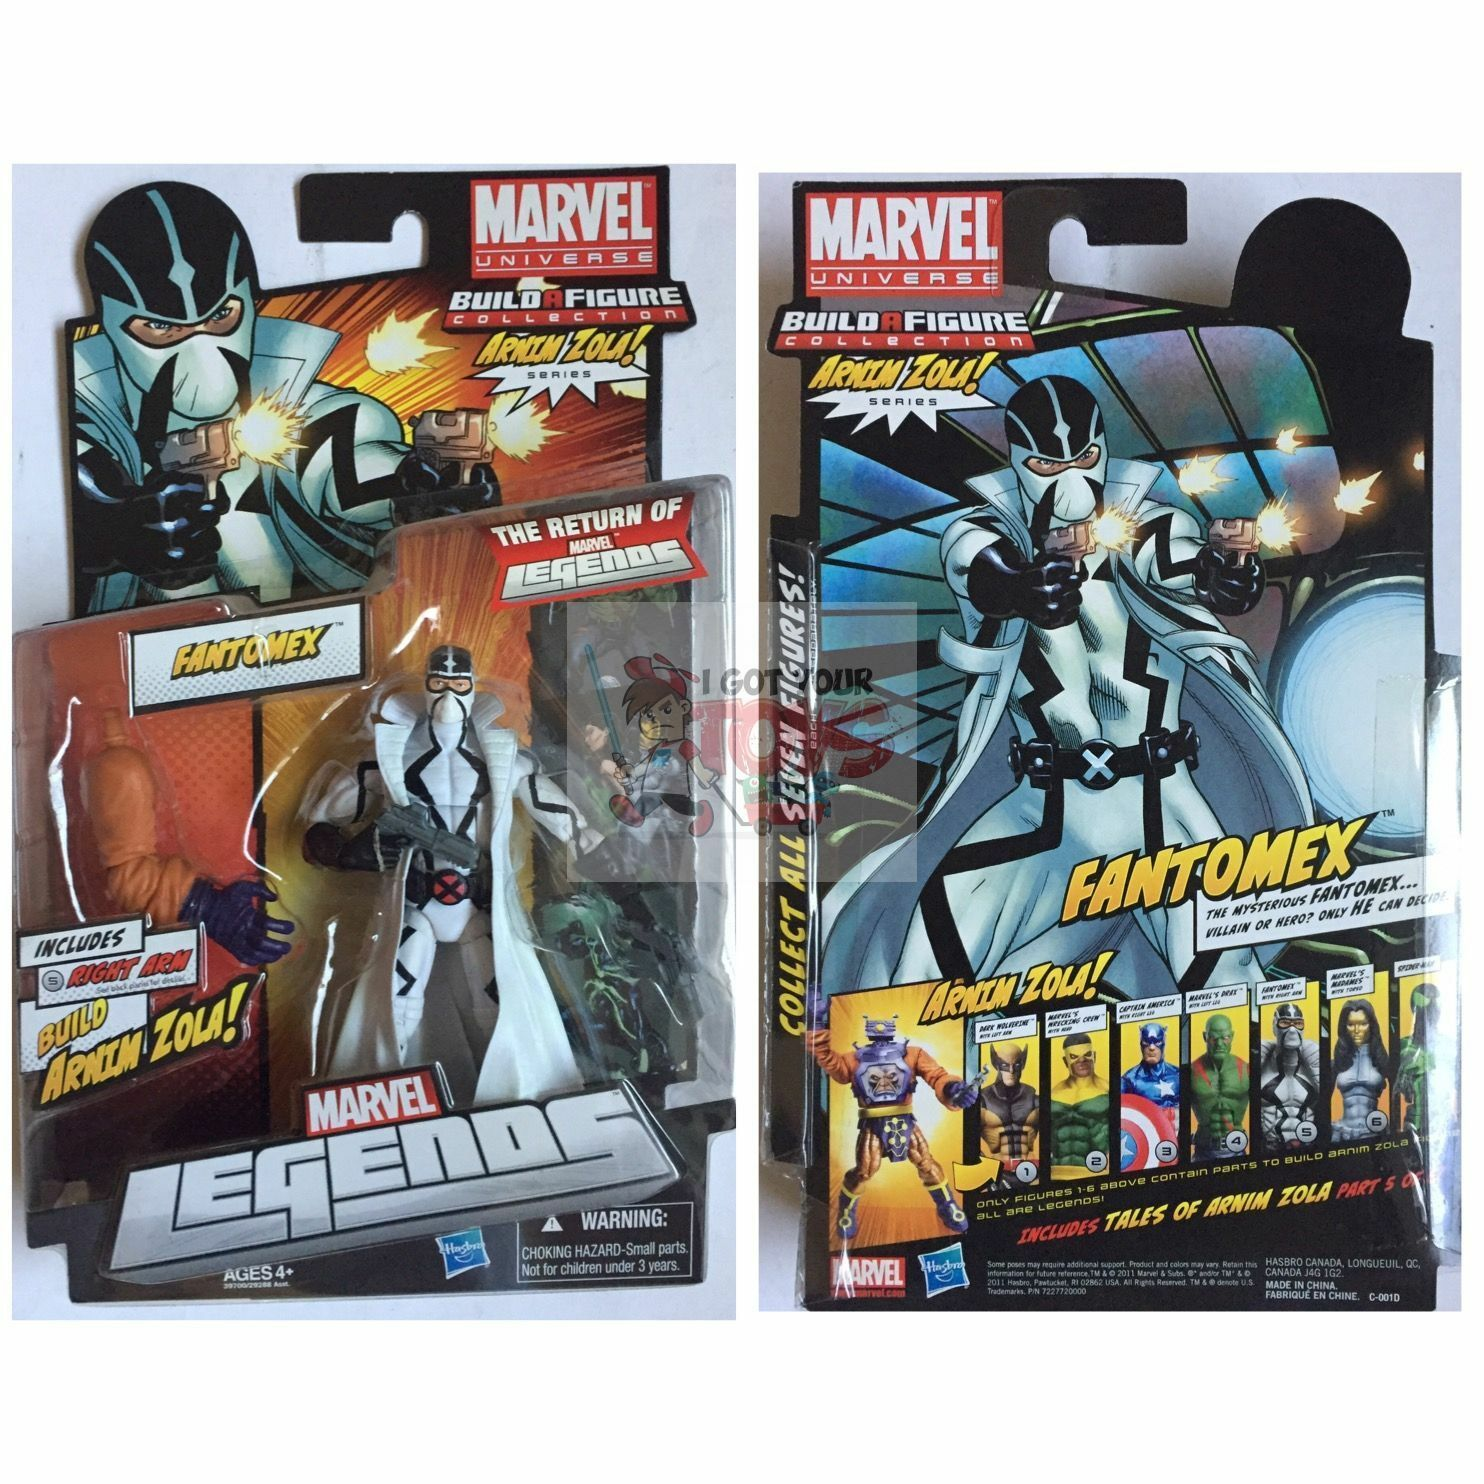 FANTOMEX + ARNIN ZOLA PIECE Marvel Legends HASBRO 2011 6